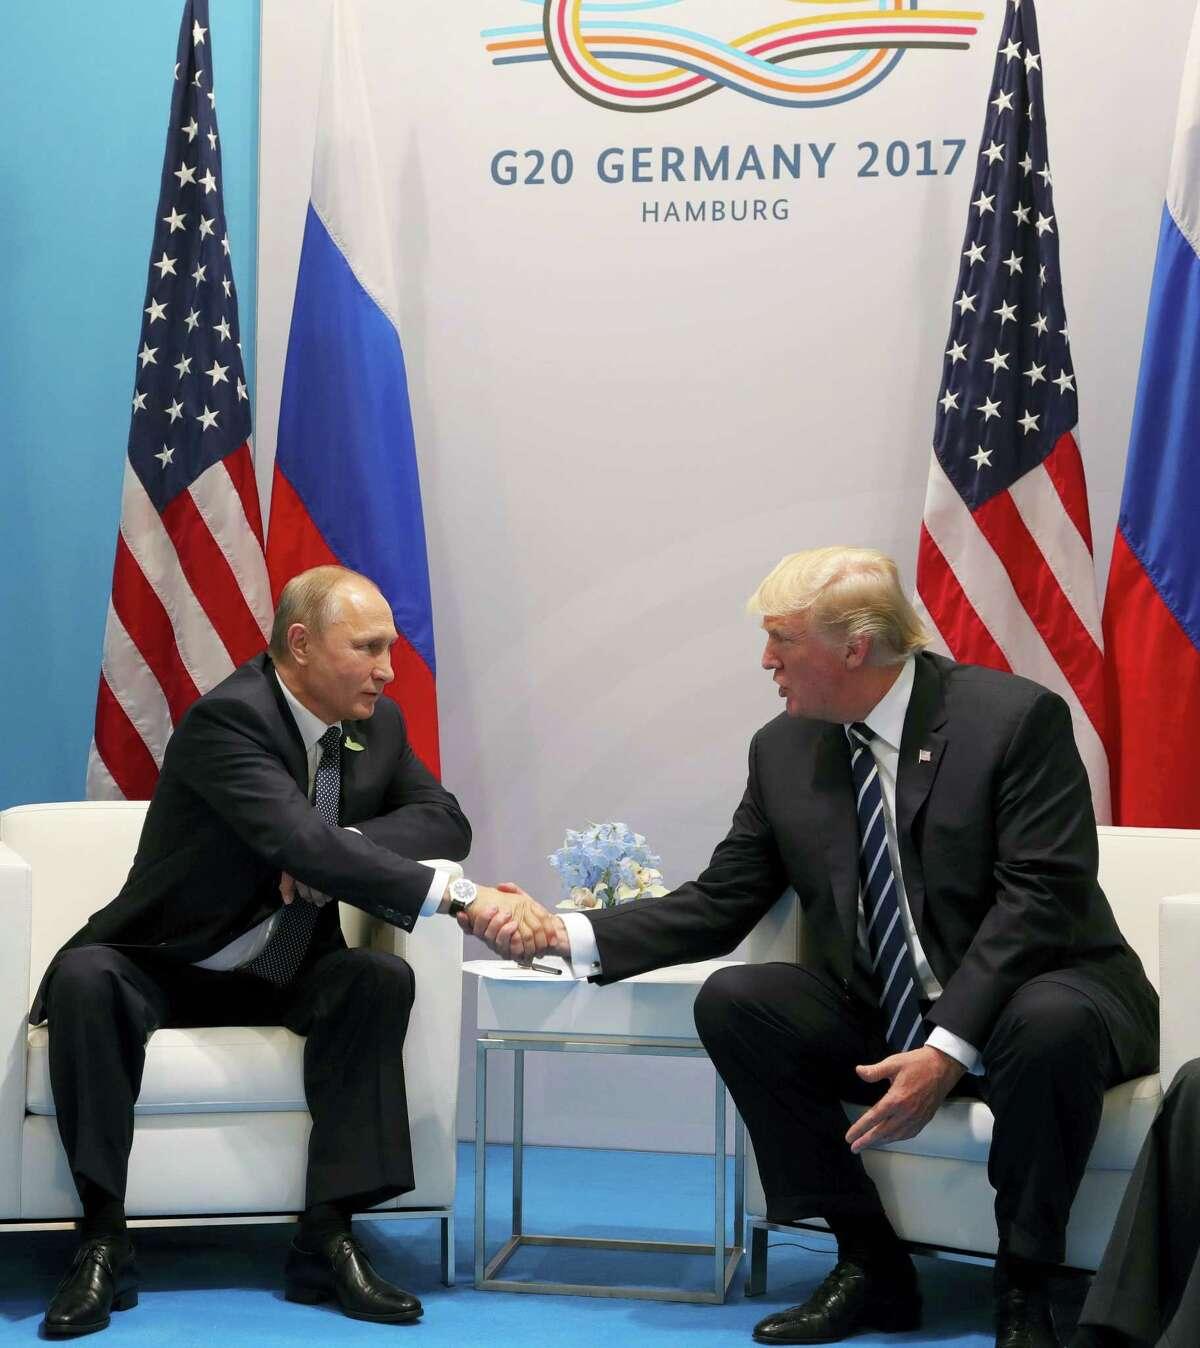 U.S. President Donald Trump, right, and Russian President Vladimir Putin shake handsduring the G20 summit in Hamburg Germany, Friday July 7, 2017.